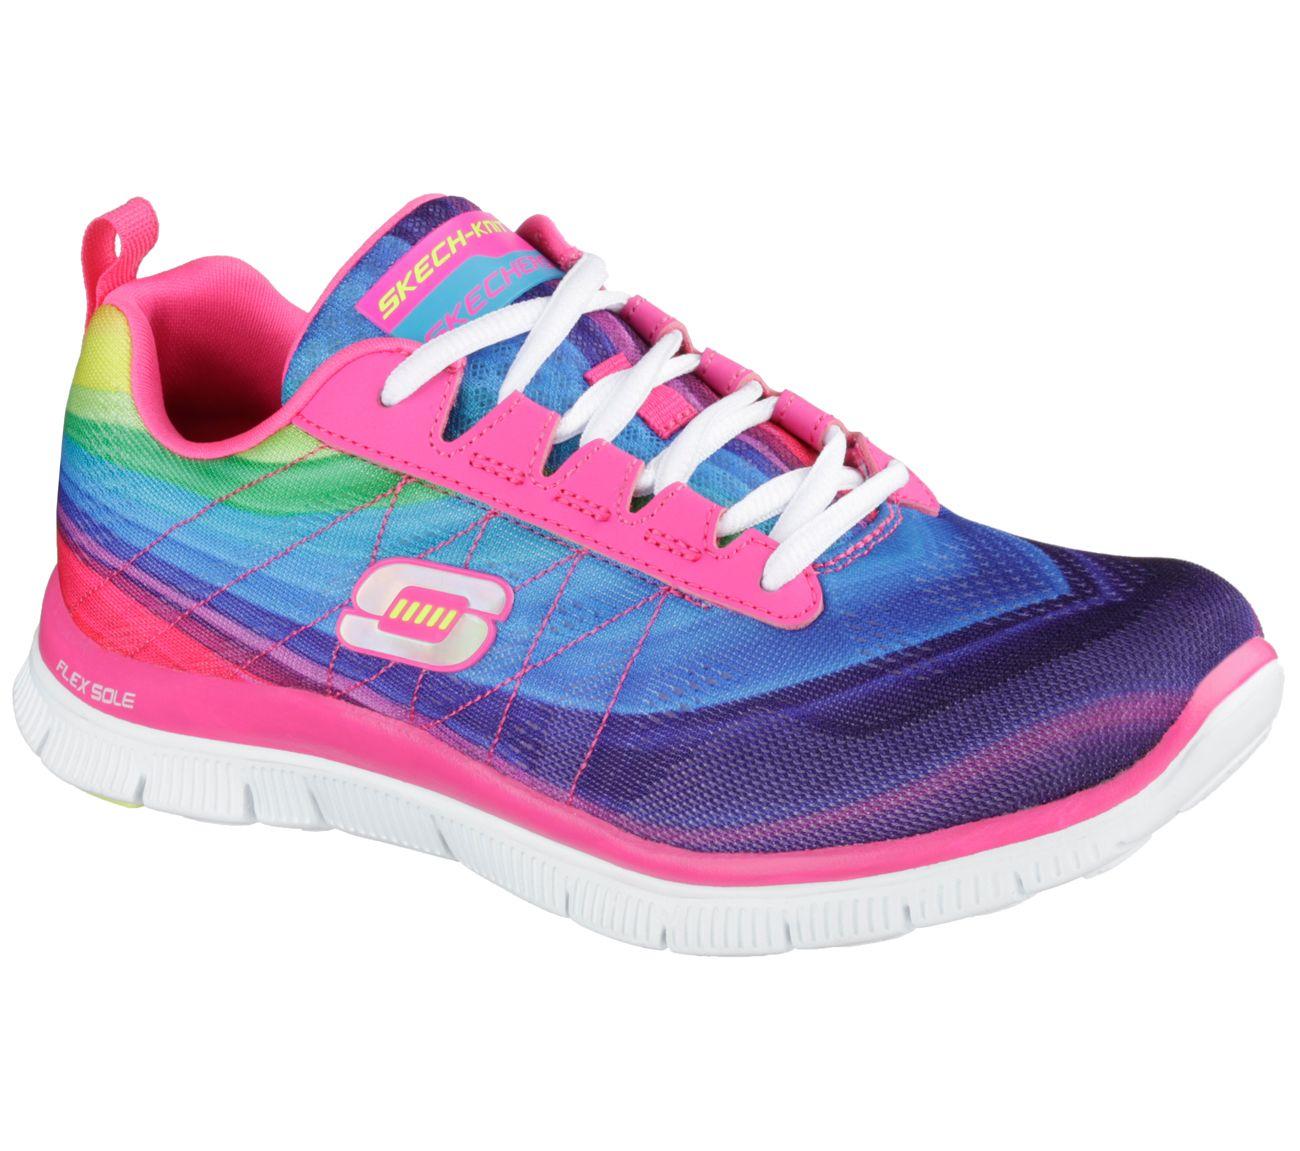 Skechers 22147 Raibow Flex  Women's  Shoes SZ 6